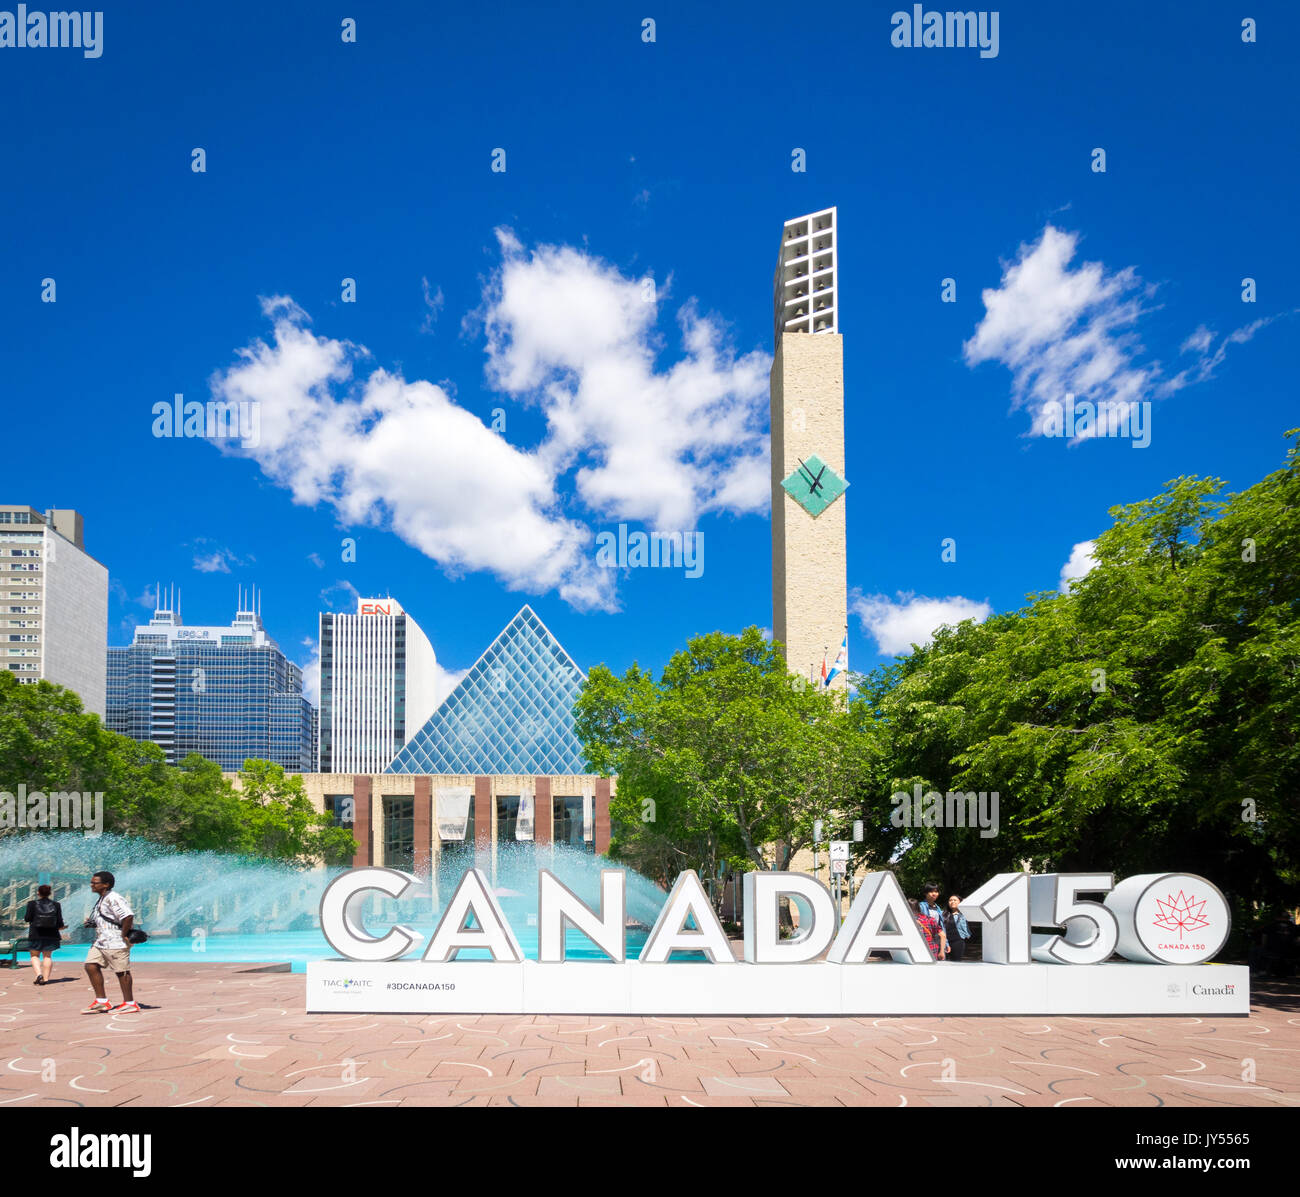 Le Canada 150 3D signe à Sir Winston Churchill Square à Edmonton, Alberta, Canada. L'enseigne célèbre le 150e anniversaire du Canada Photo Stock